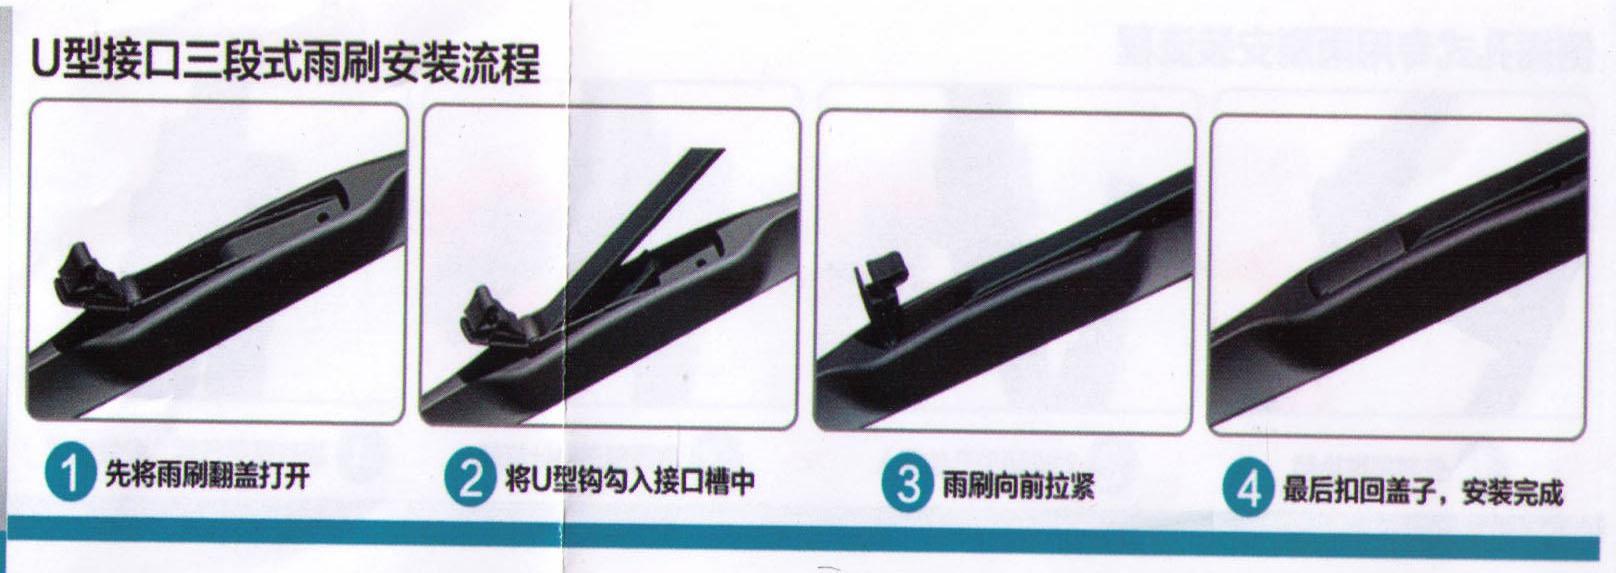 U型接口三段式雨刷安装流程.jpg